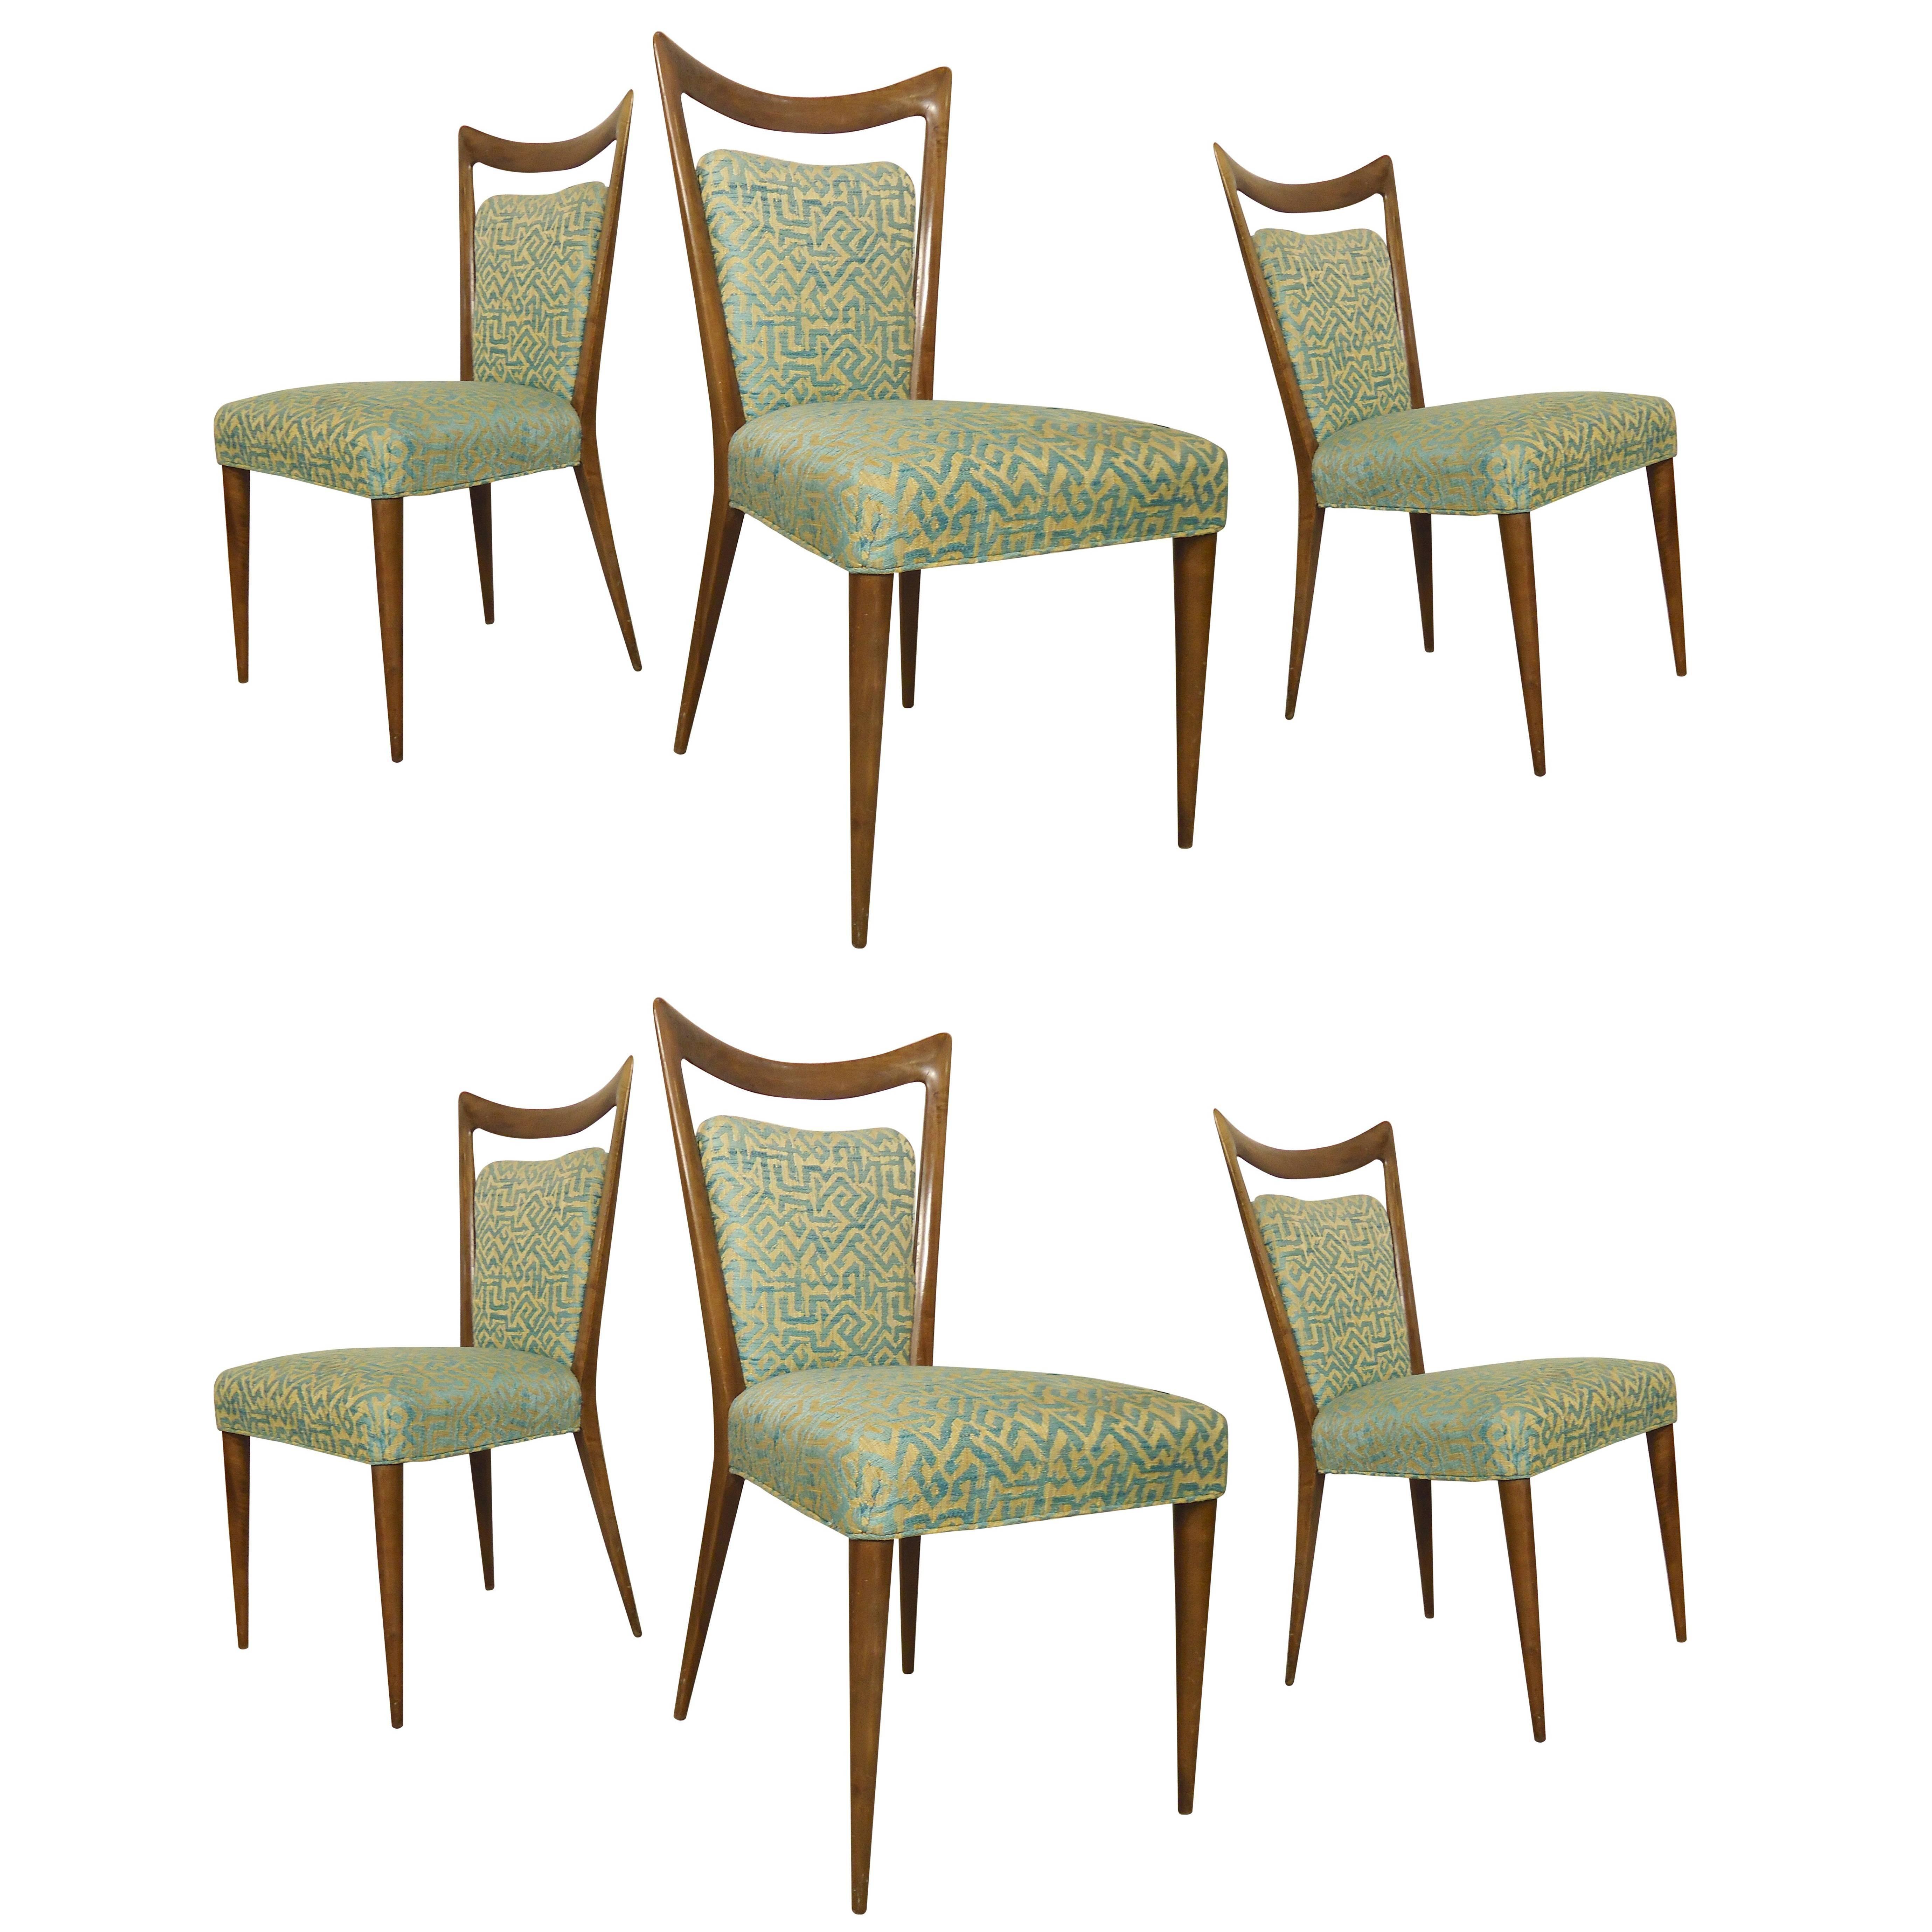 Melchiorre Bega Designed Mid-Century Chairs